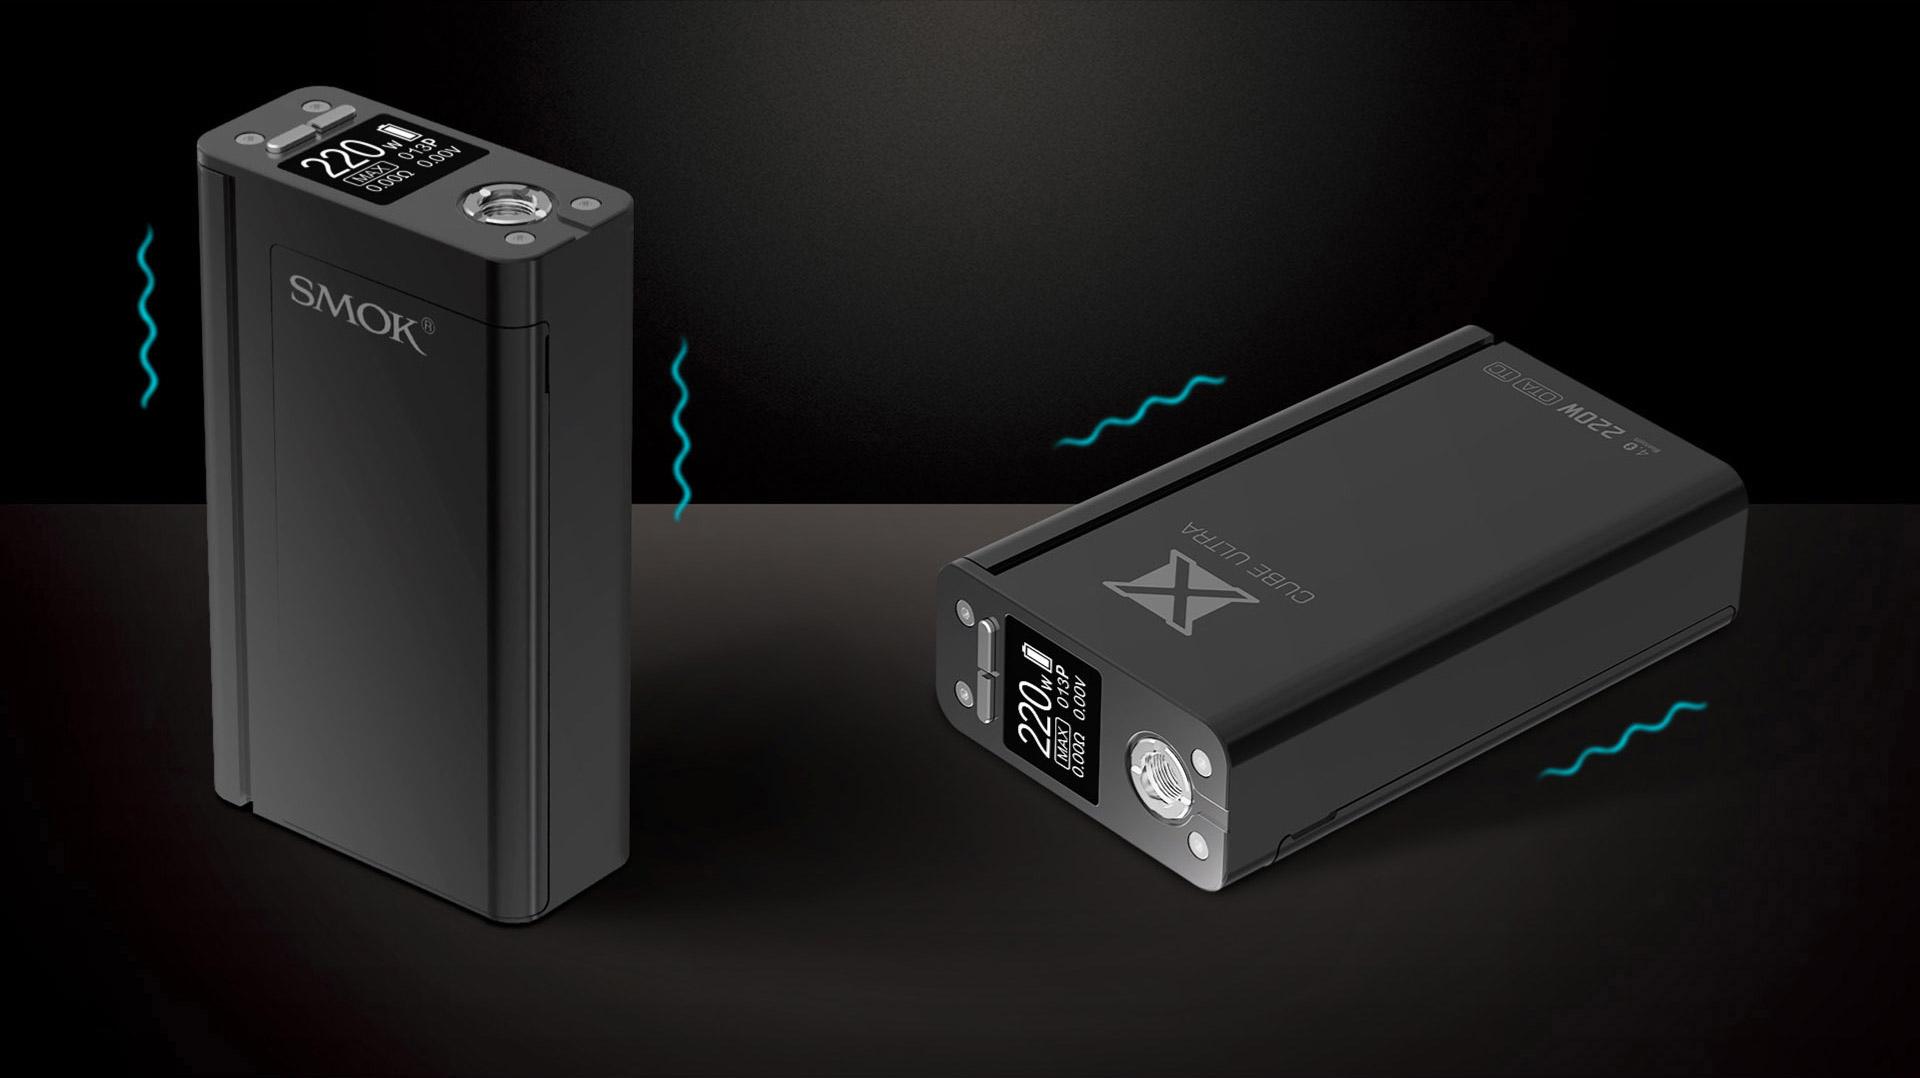 Smok-Xcube-Ultra-220w